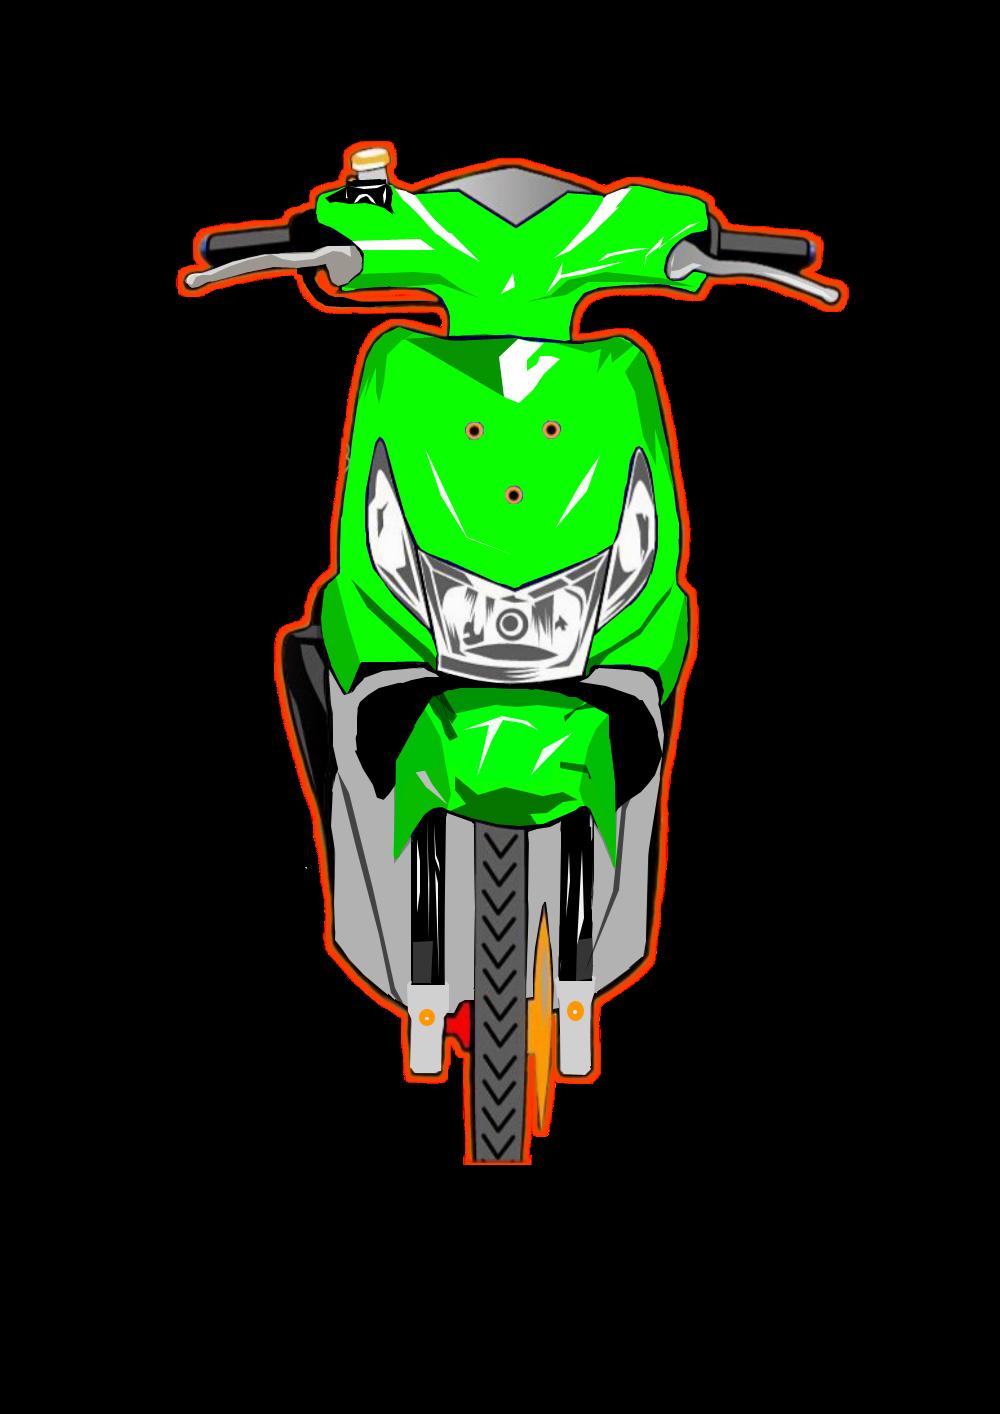 Honda Beat Vector : honda, vector, Desain, Vektor,, Otomotif,